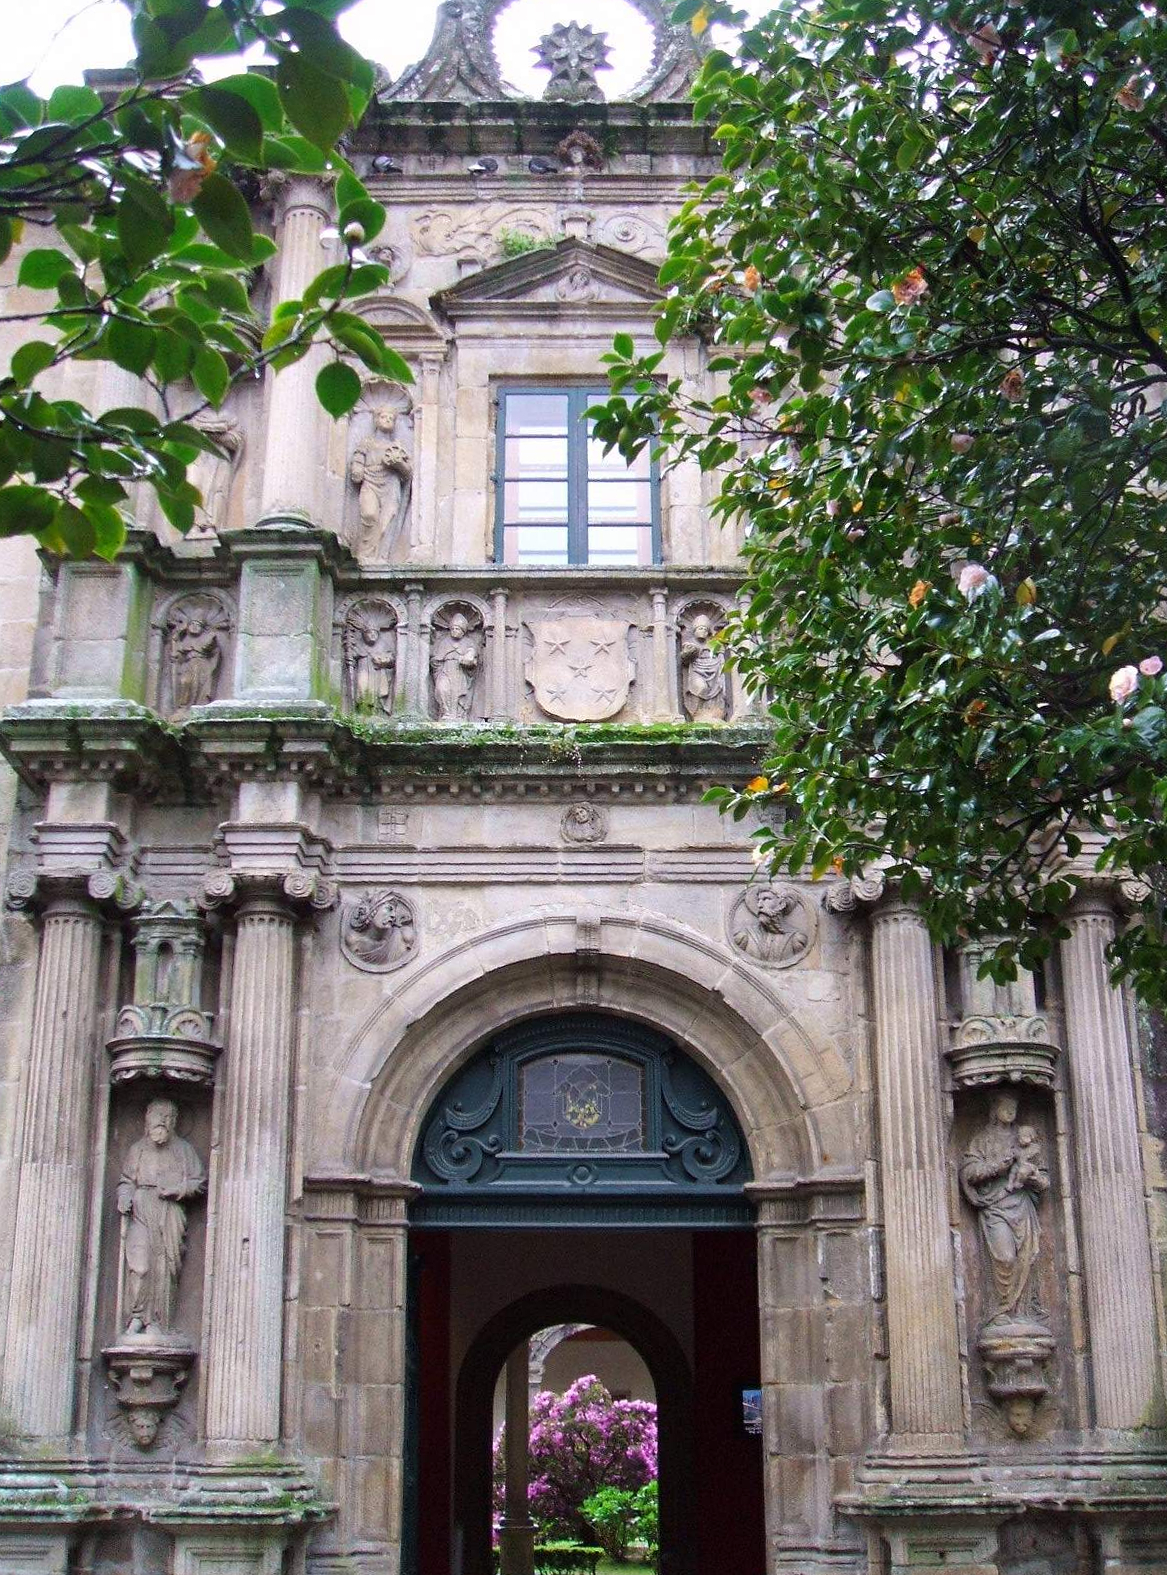 https://upload.wikimedia.org/wikipedia/commons/1/1f/Santiago_de_Compostela_-_Colegio_de_Fonseca_%28o_de_Santiago_Alfeo%29Biblioteca_General_de_la_Universidad_2.jpg